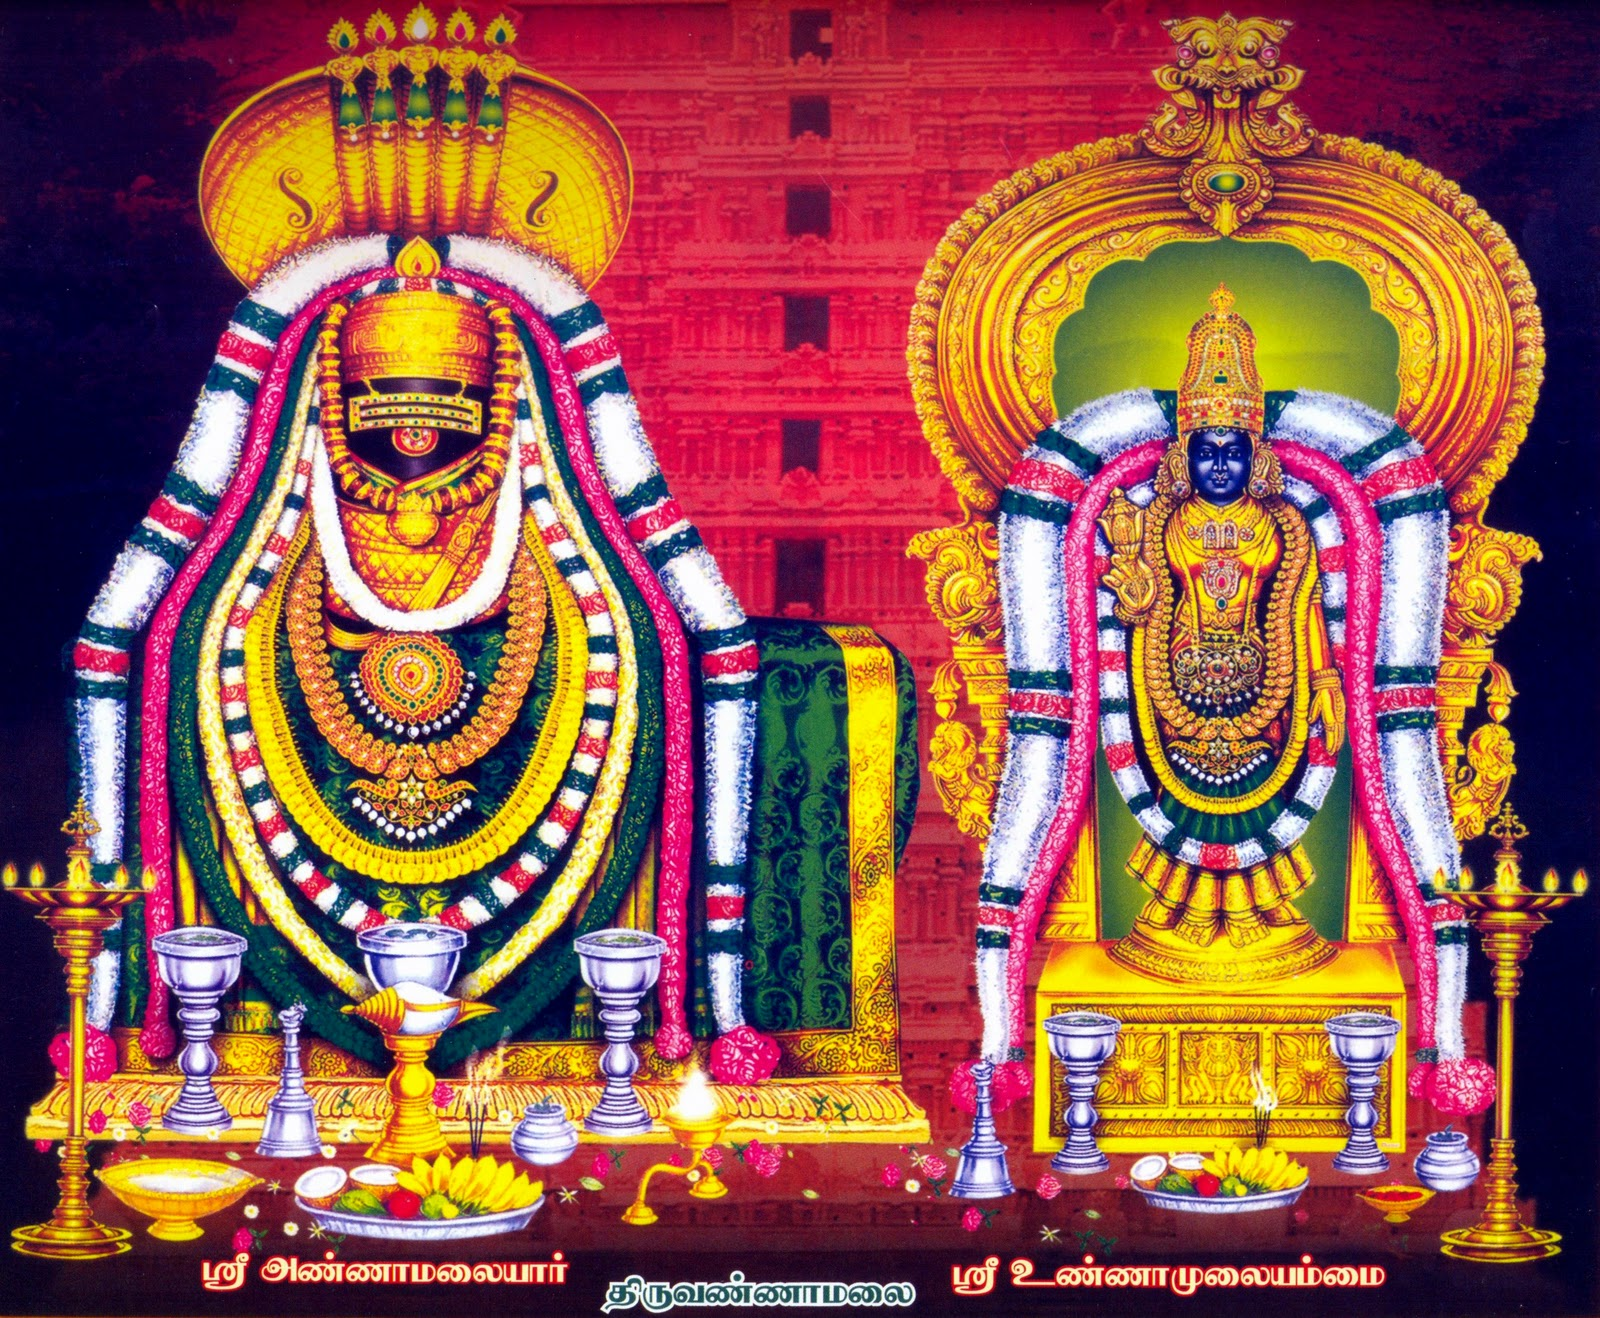 http://2.bp.blogspot.com/-TndXzWjIeP0/TpkGdKatgBI/AAAAAAAAEeQ/9Rr9iP0cP-g/s1600/arunachaleswarar-unnamalaiyaal-tiruvannamalai-temple-tamilnadu.jpg